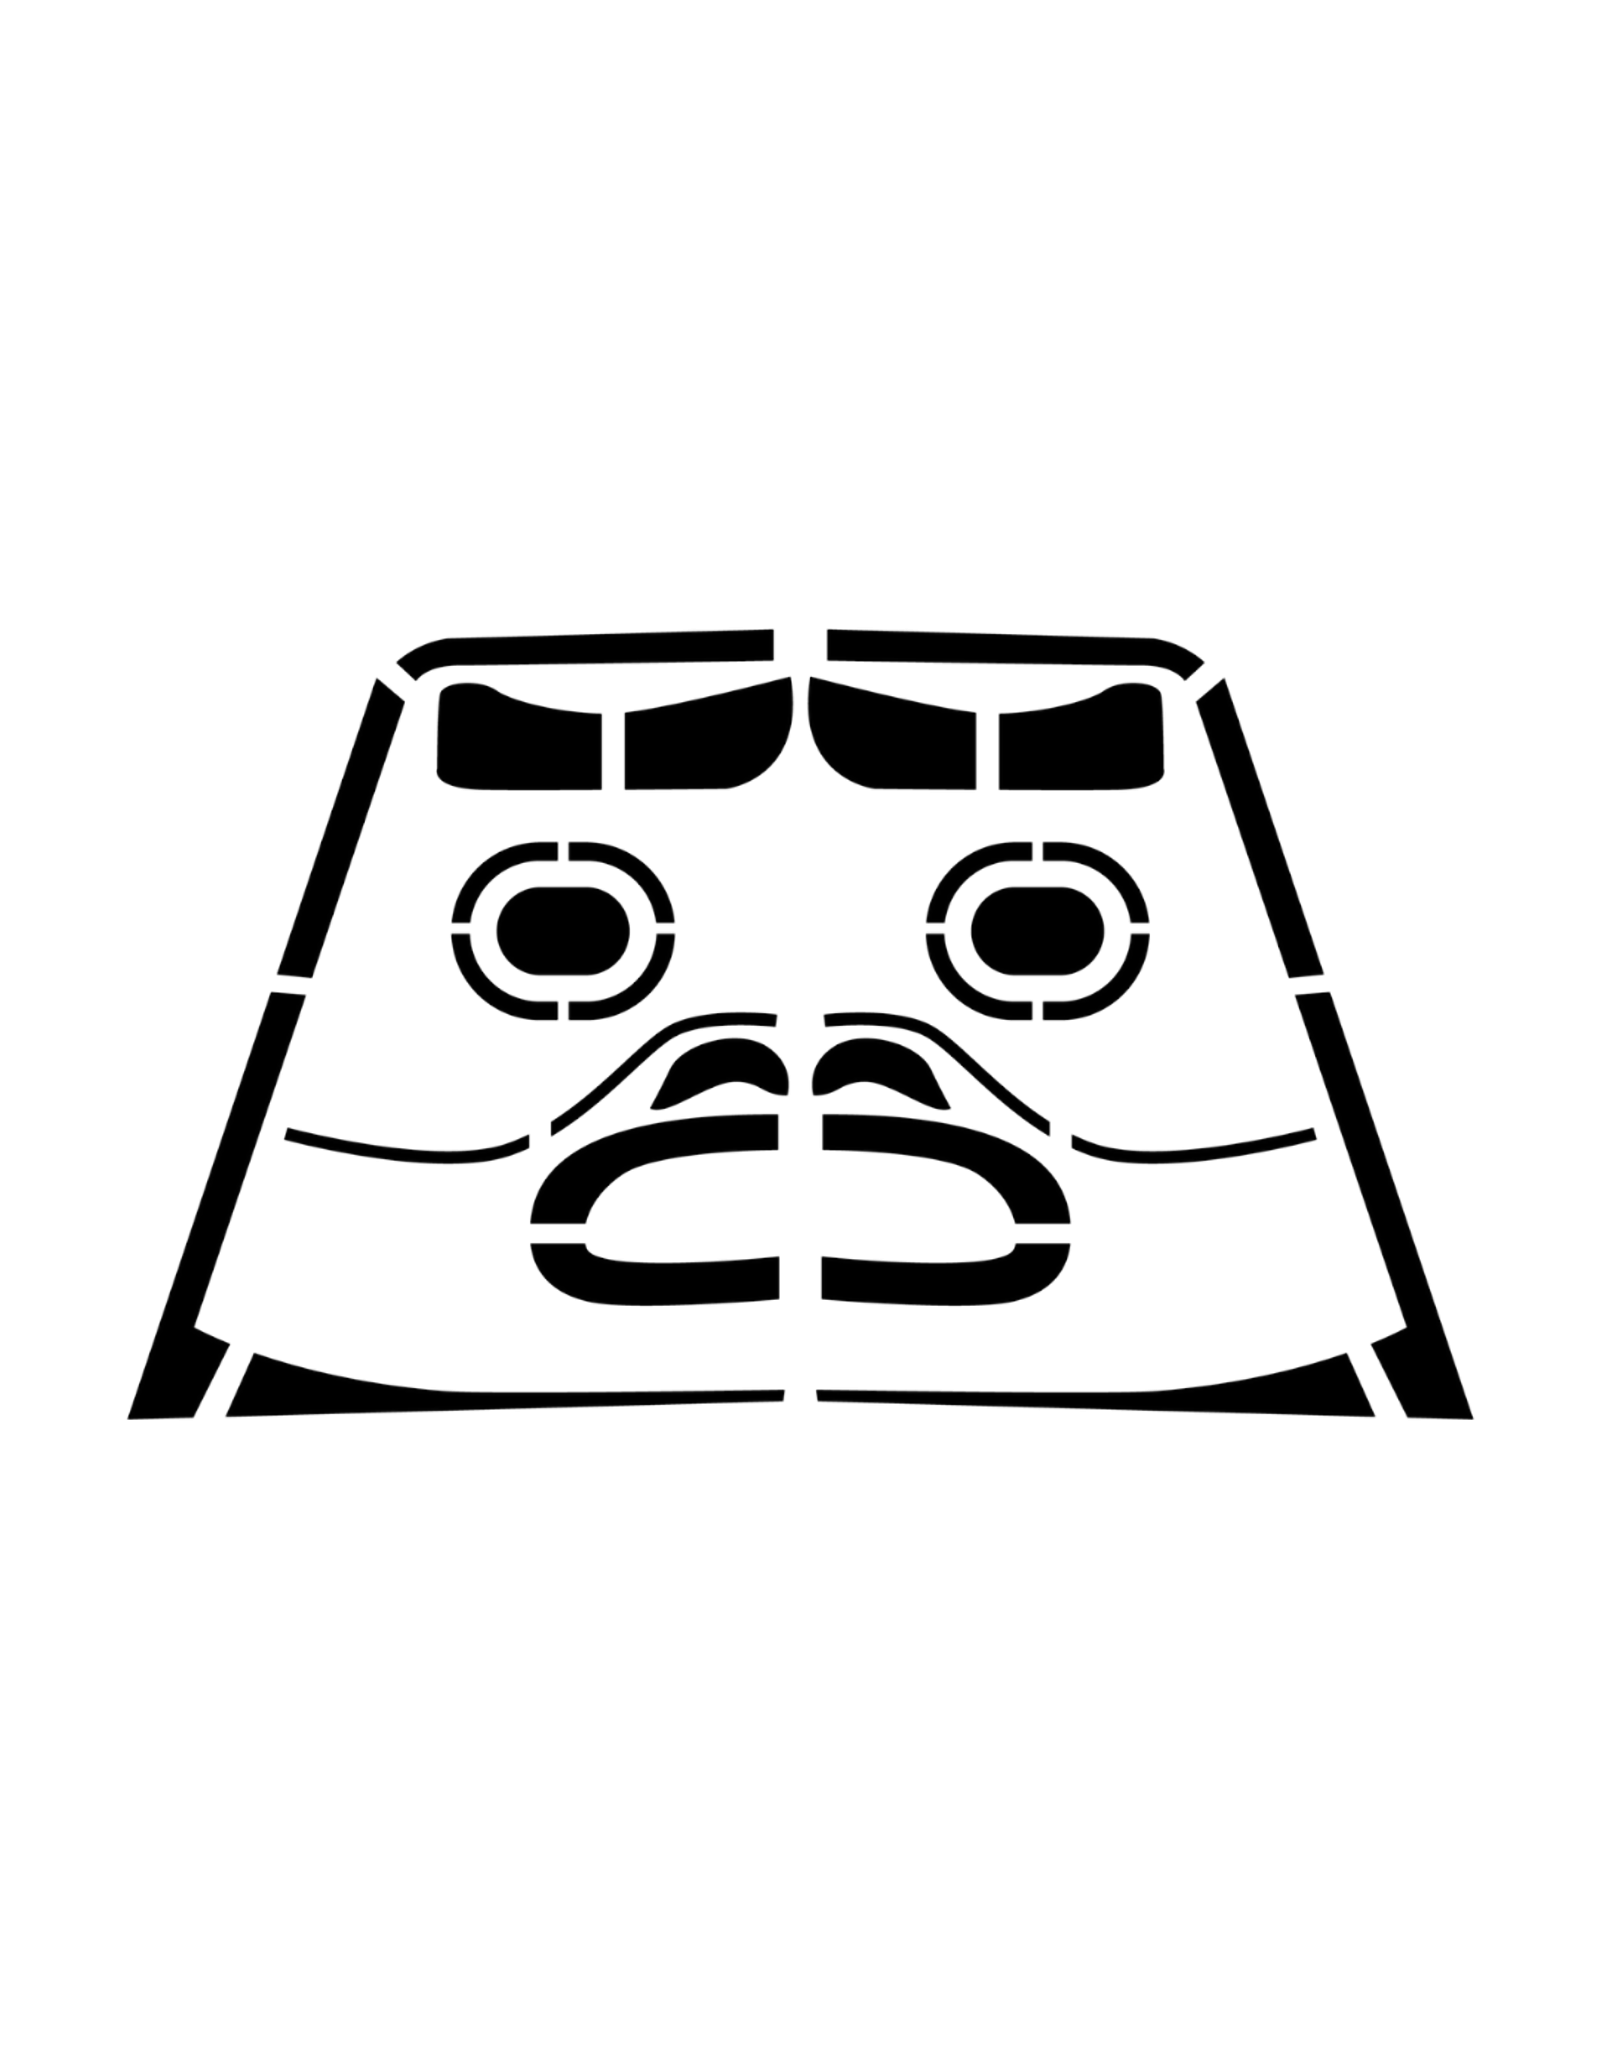 Archie Cavanaugh Totem | Archie Cavanaugh, Jr.